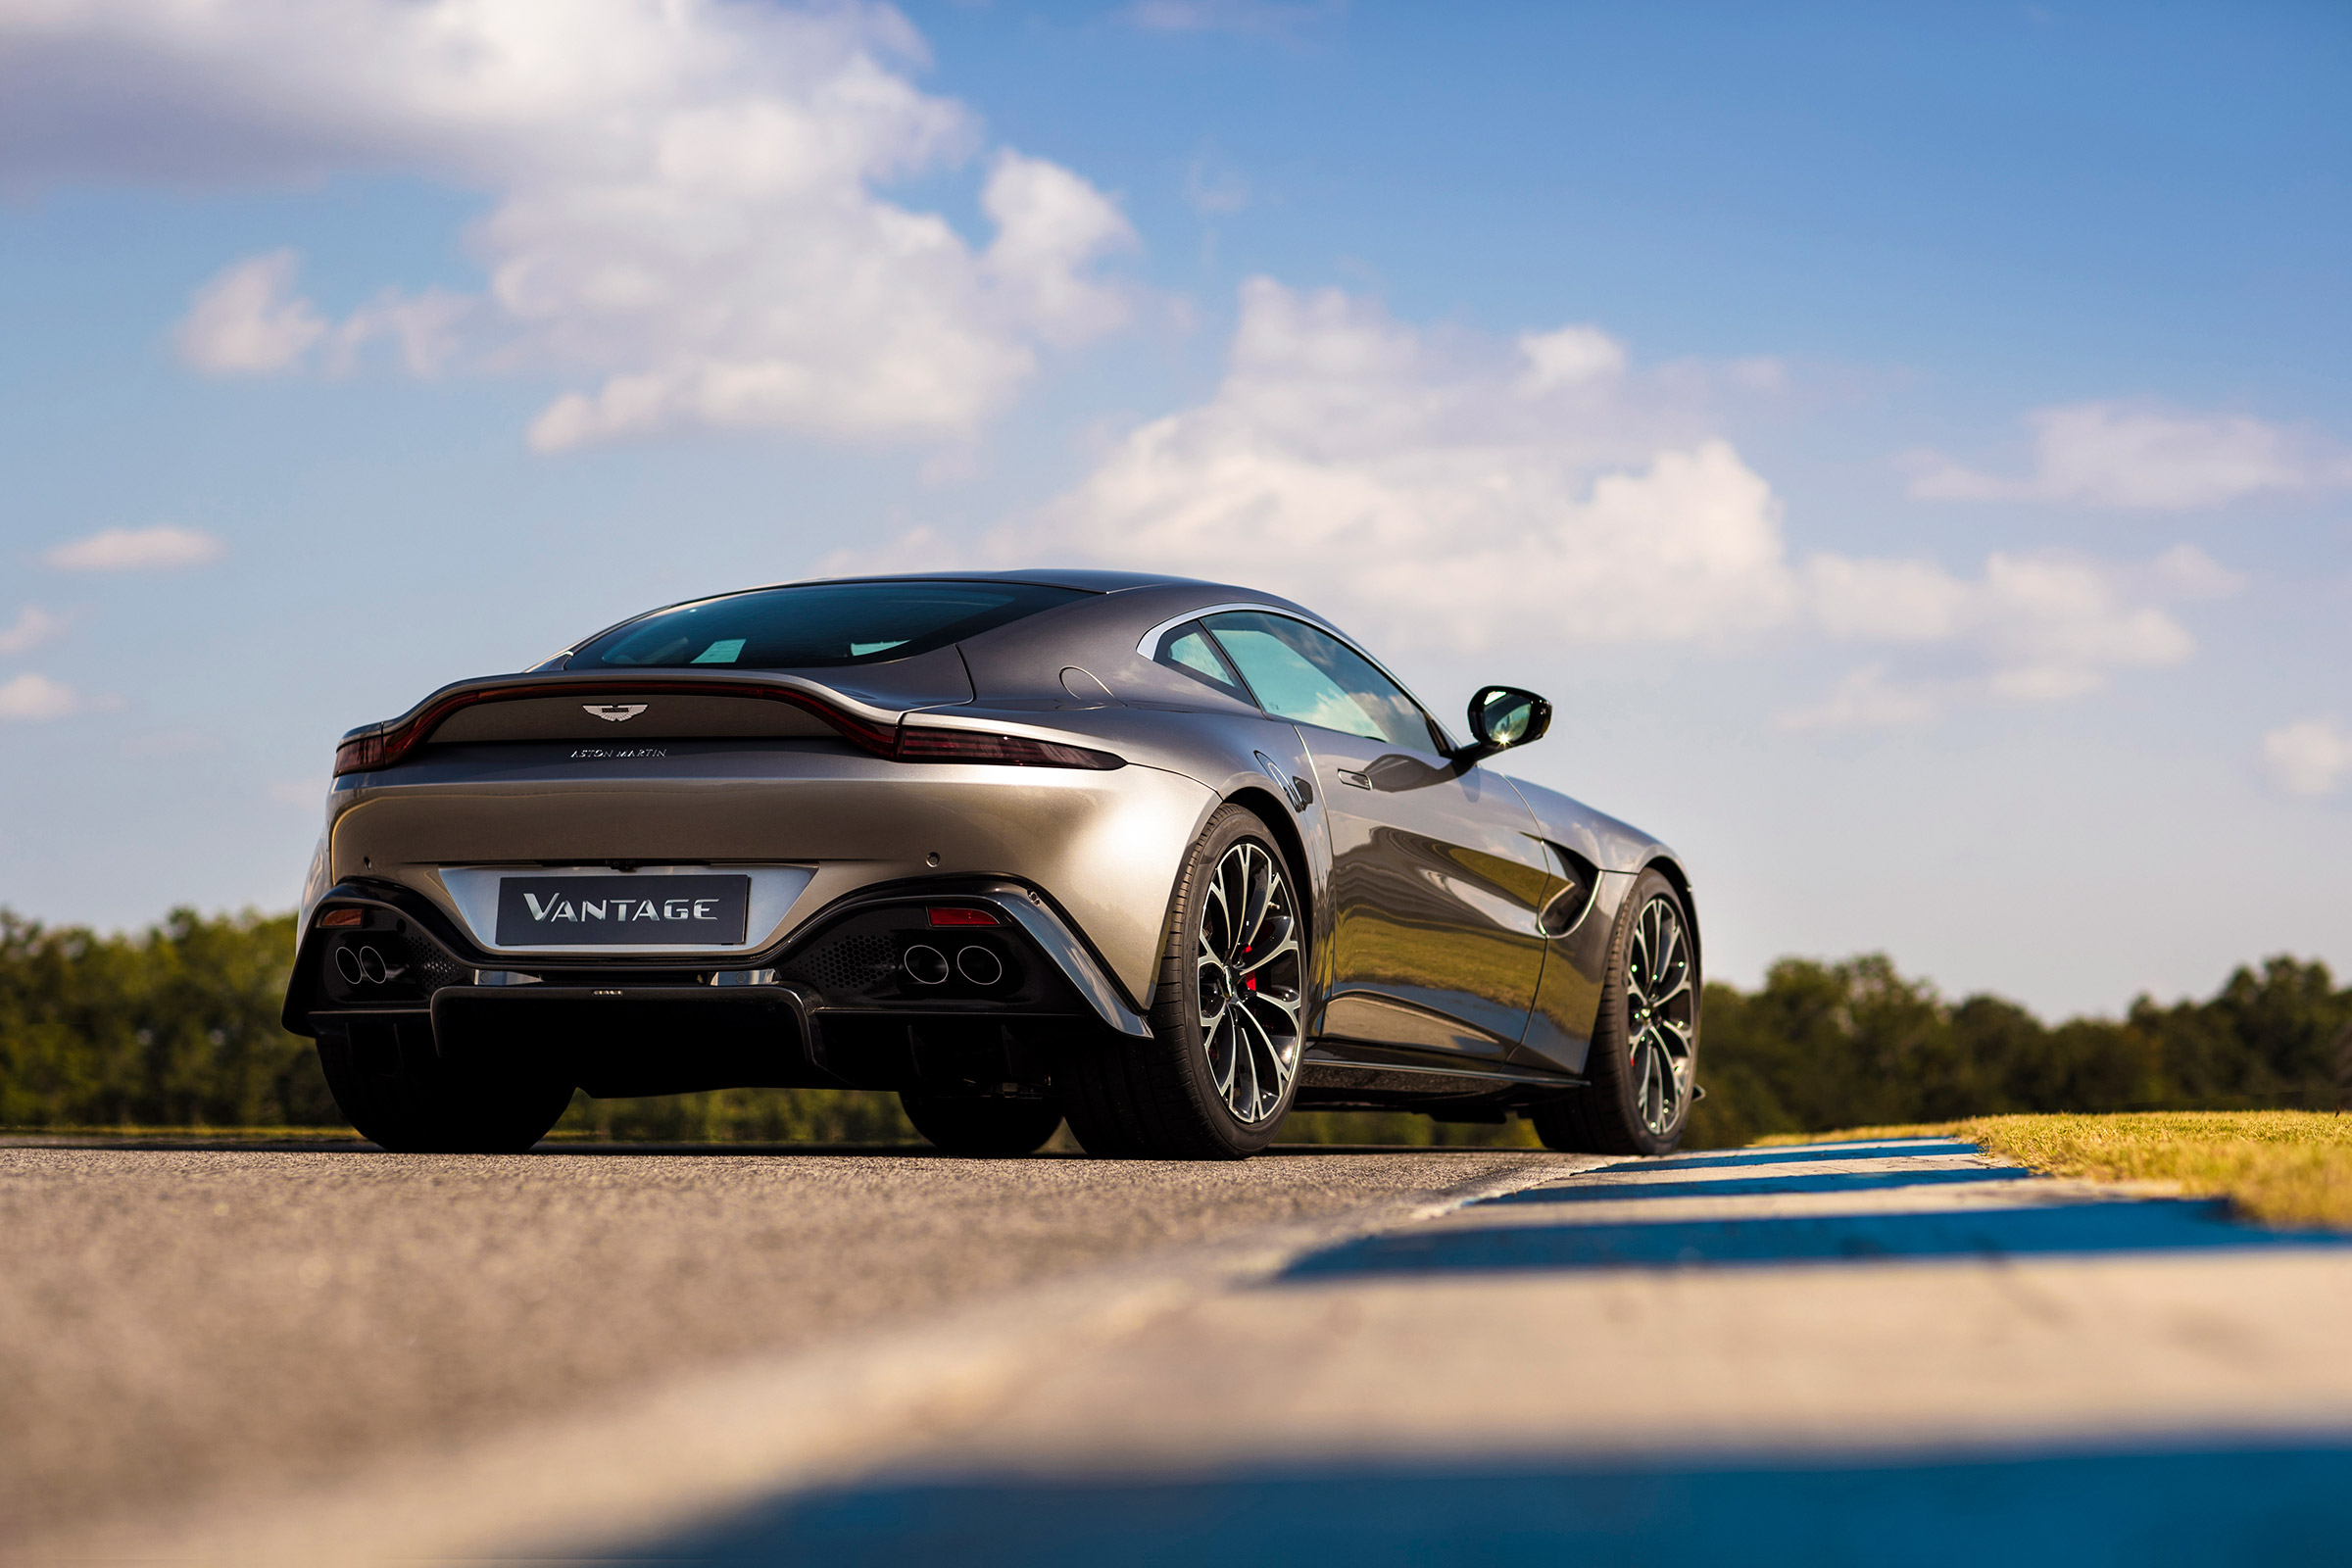 New Aston Martin Vantage Revealed Full Details And Specs On Aston S V8 Sports Car Evo